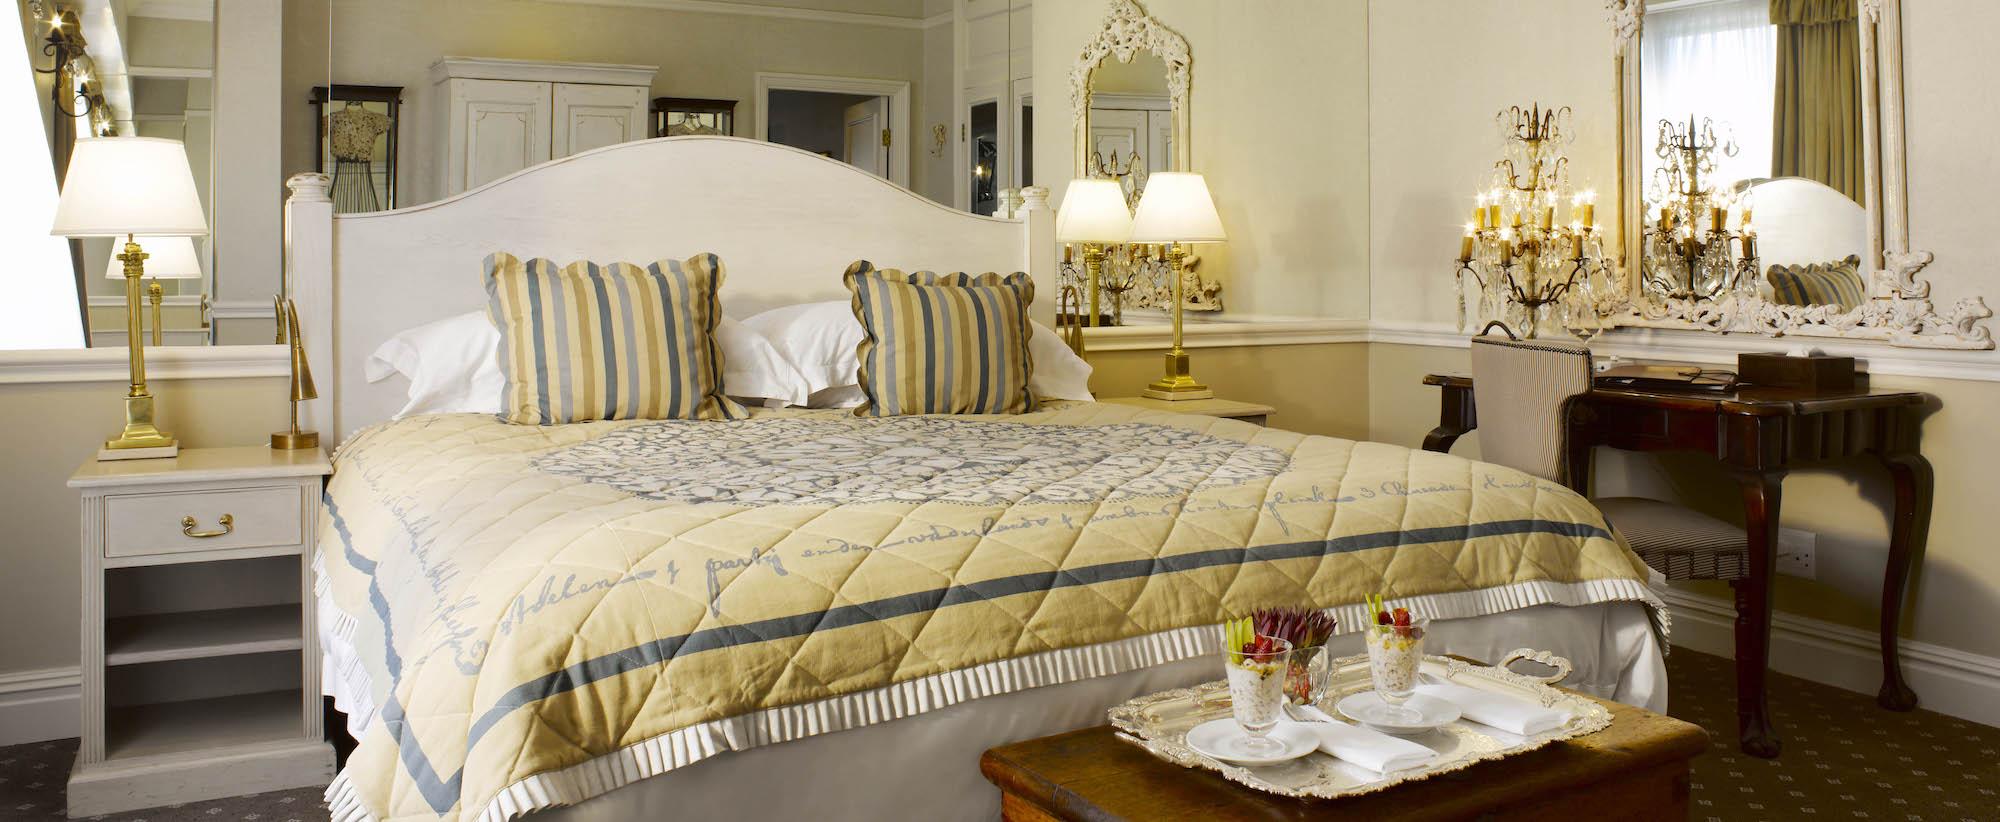 South Africa Safari Package - City and Safari - Cape Grace Hotel Cape Town